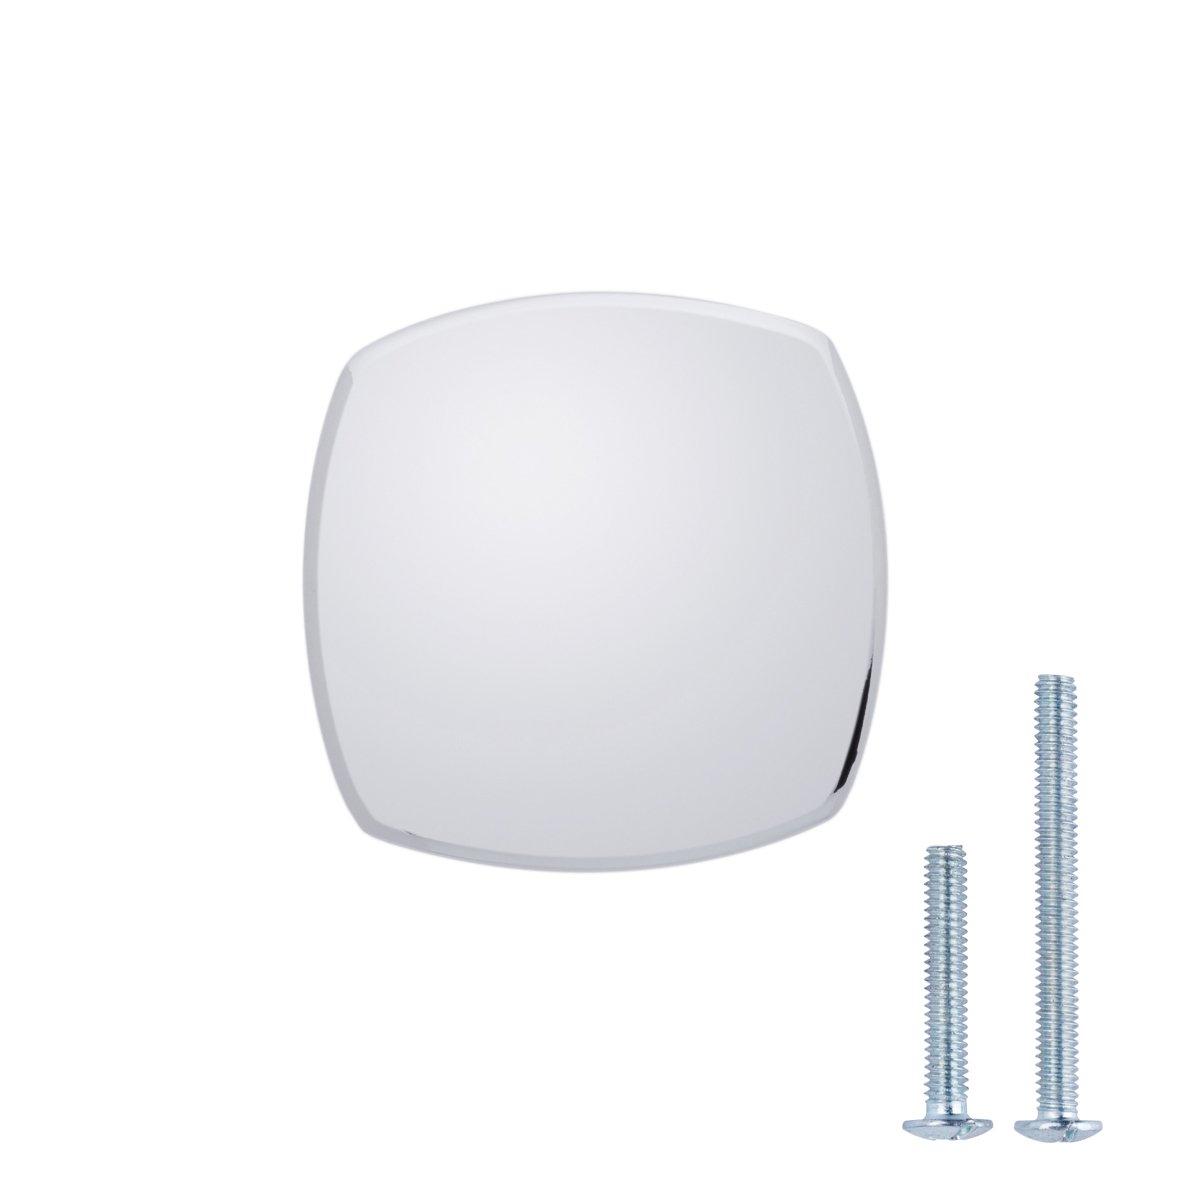 "AmazonBasics Rounded Square Cabinet Knob, 1.26"" Diameter, Polished Chrome, 10-Pack"